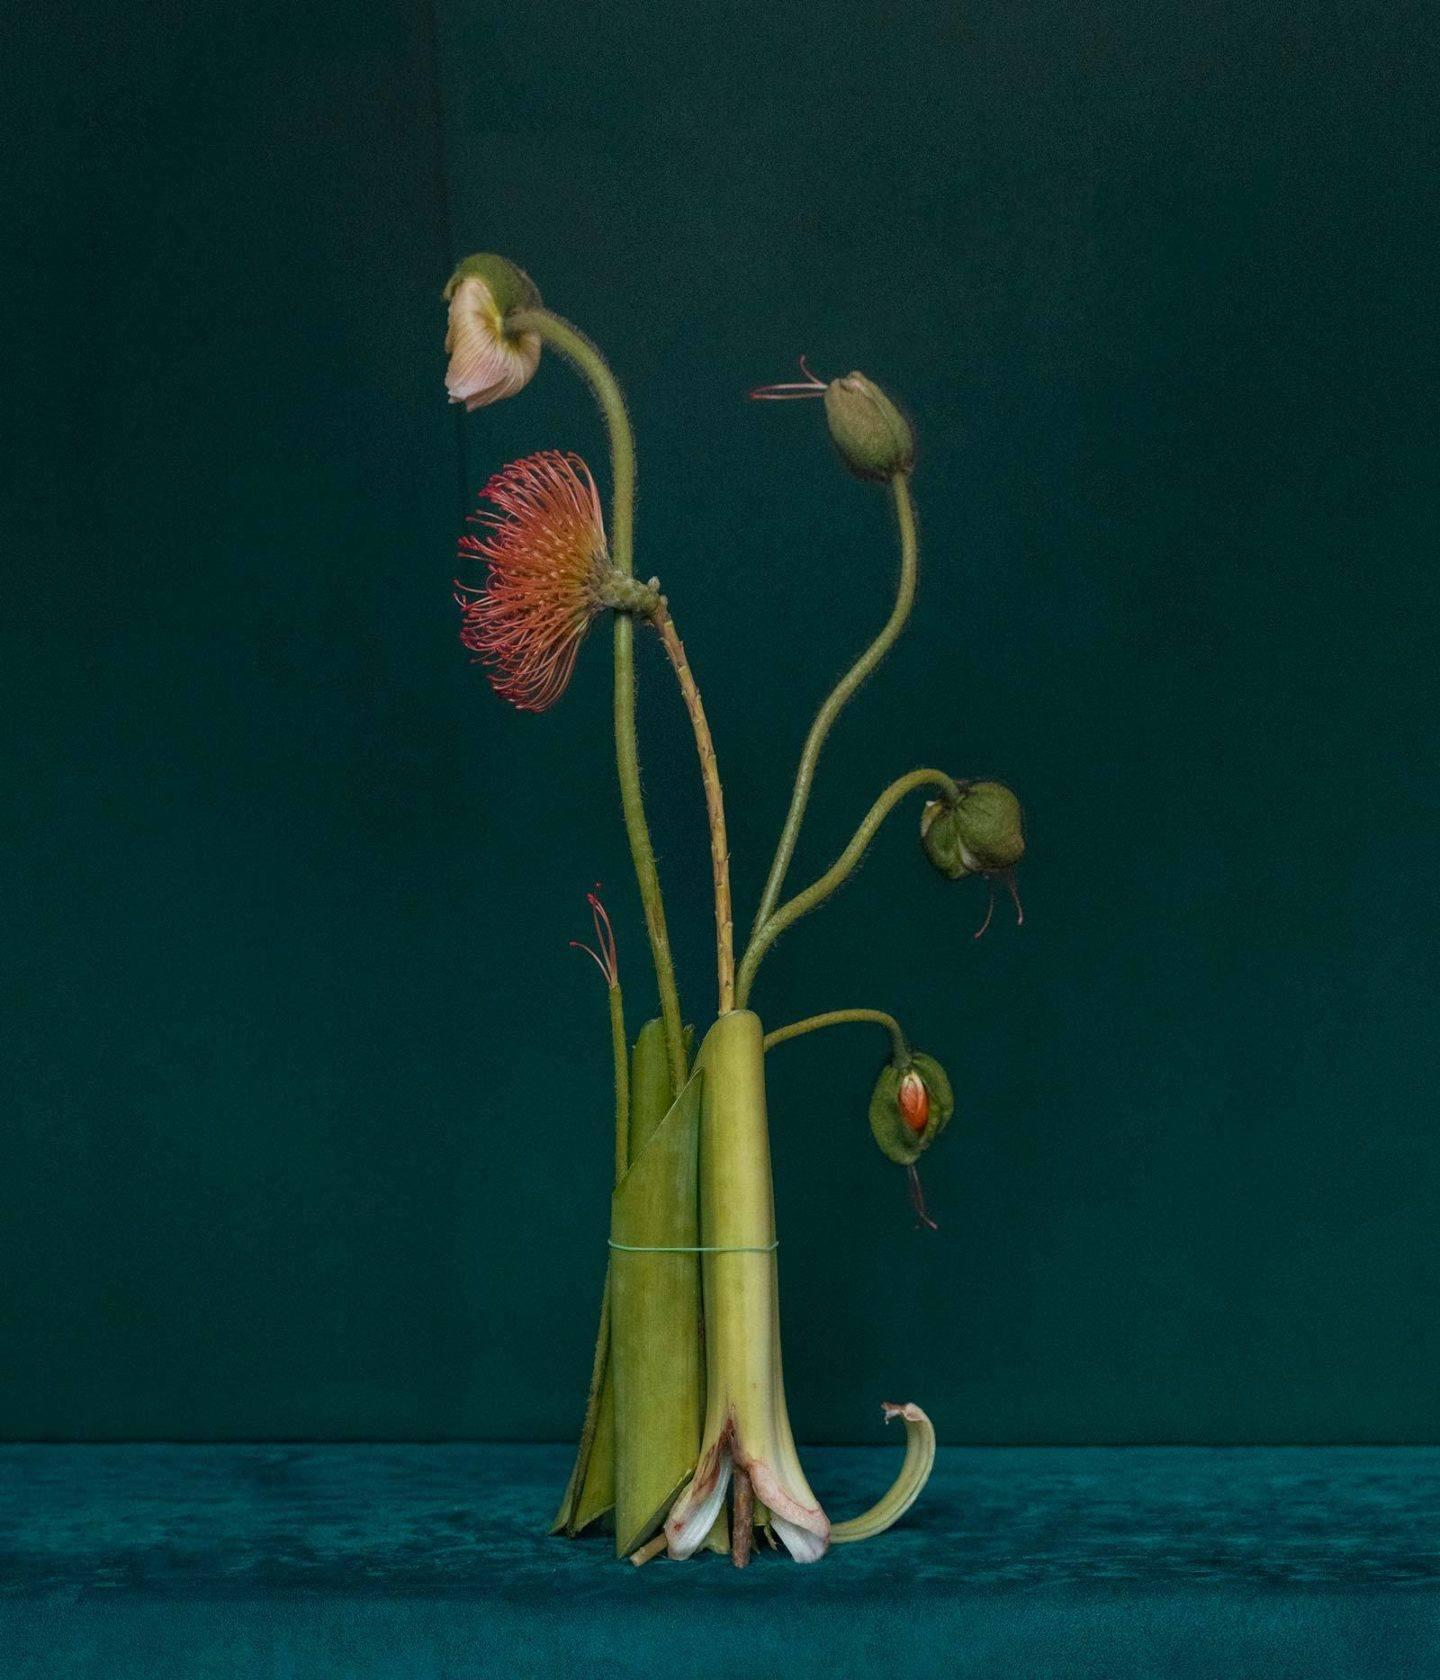 IGNANT-Art-Dominik-Tarabański-Roses-For-Mother-4